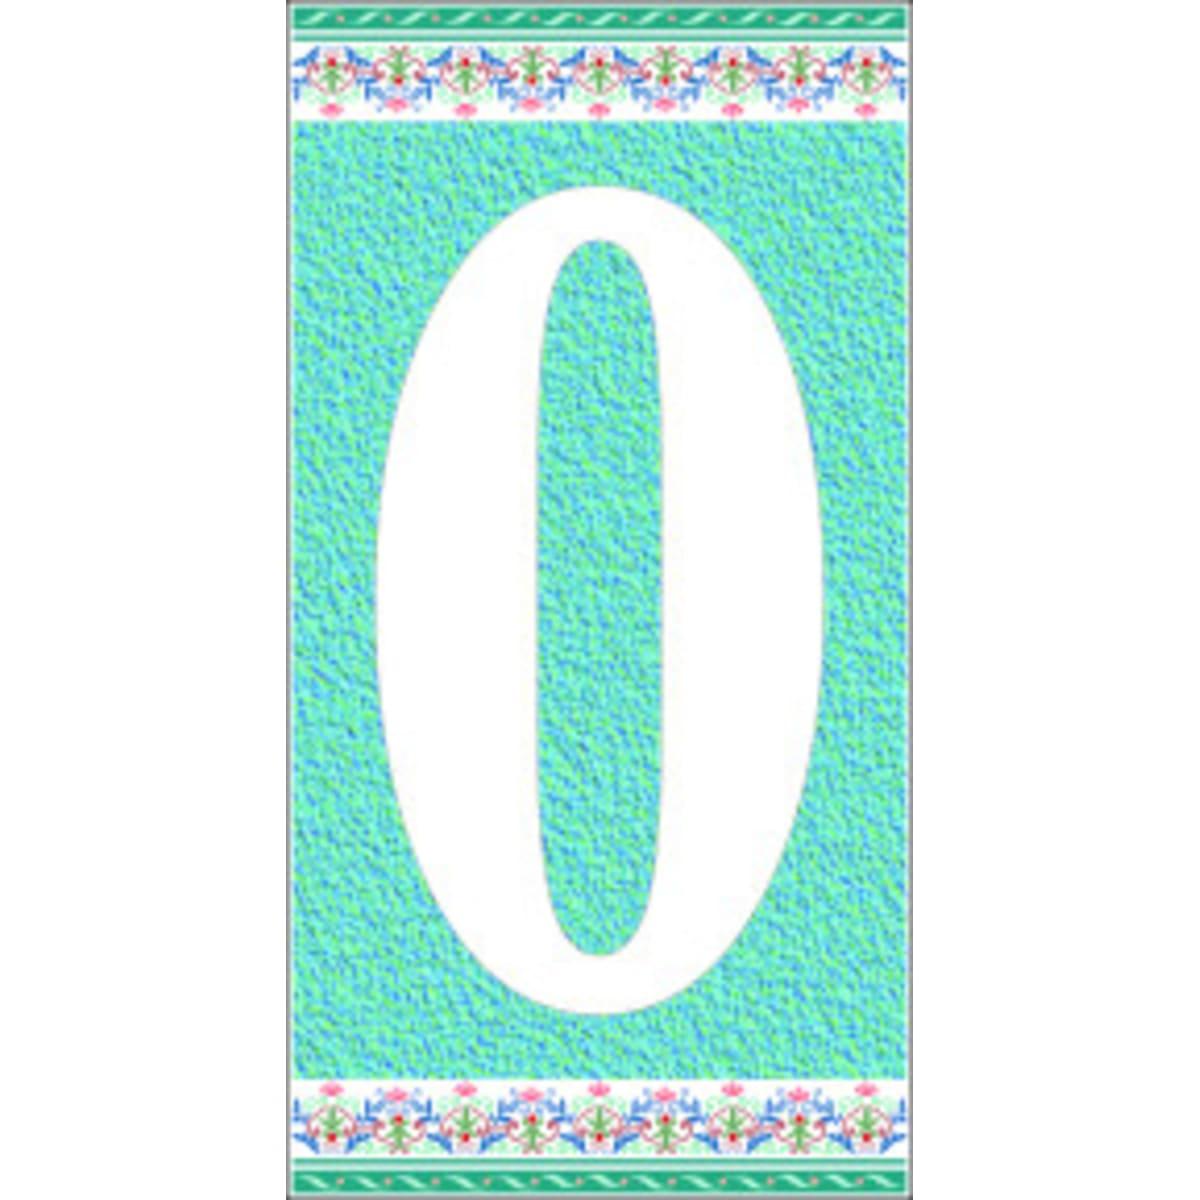 Цифра «0» самоклеящаяся 145x75 мм пенополиэтилен цвет глянцевый голубой